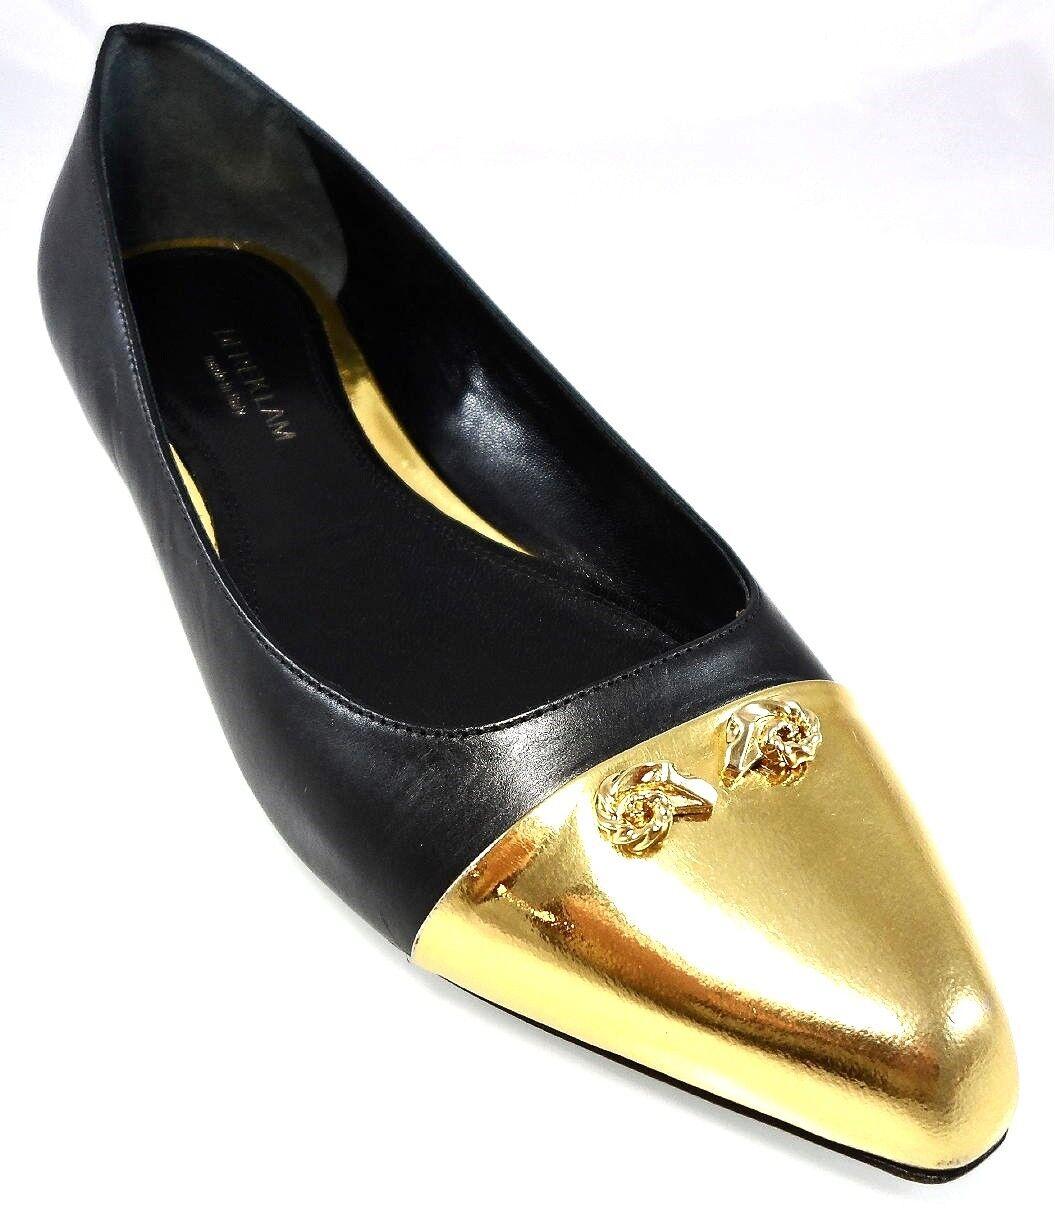 550 DEREK LAM COLLECTION AVERY SKIMMER SLIP ON FLATS gold POINT TOE Womens 39 9